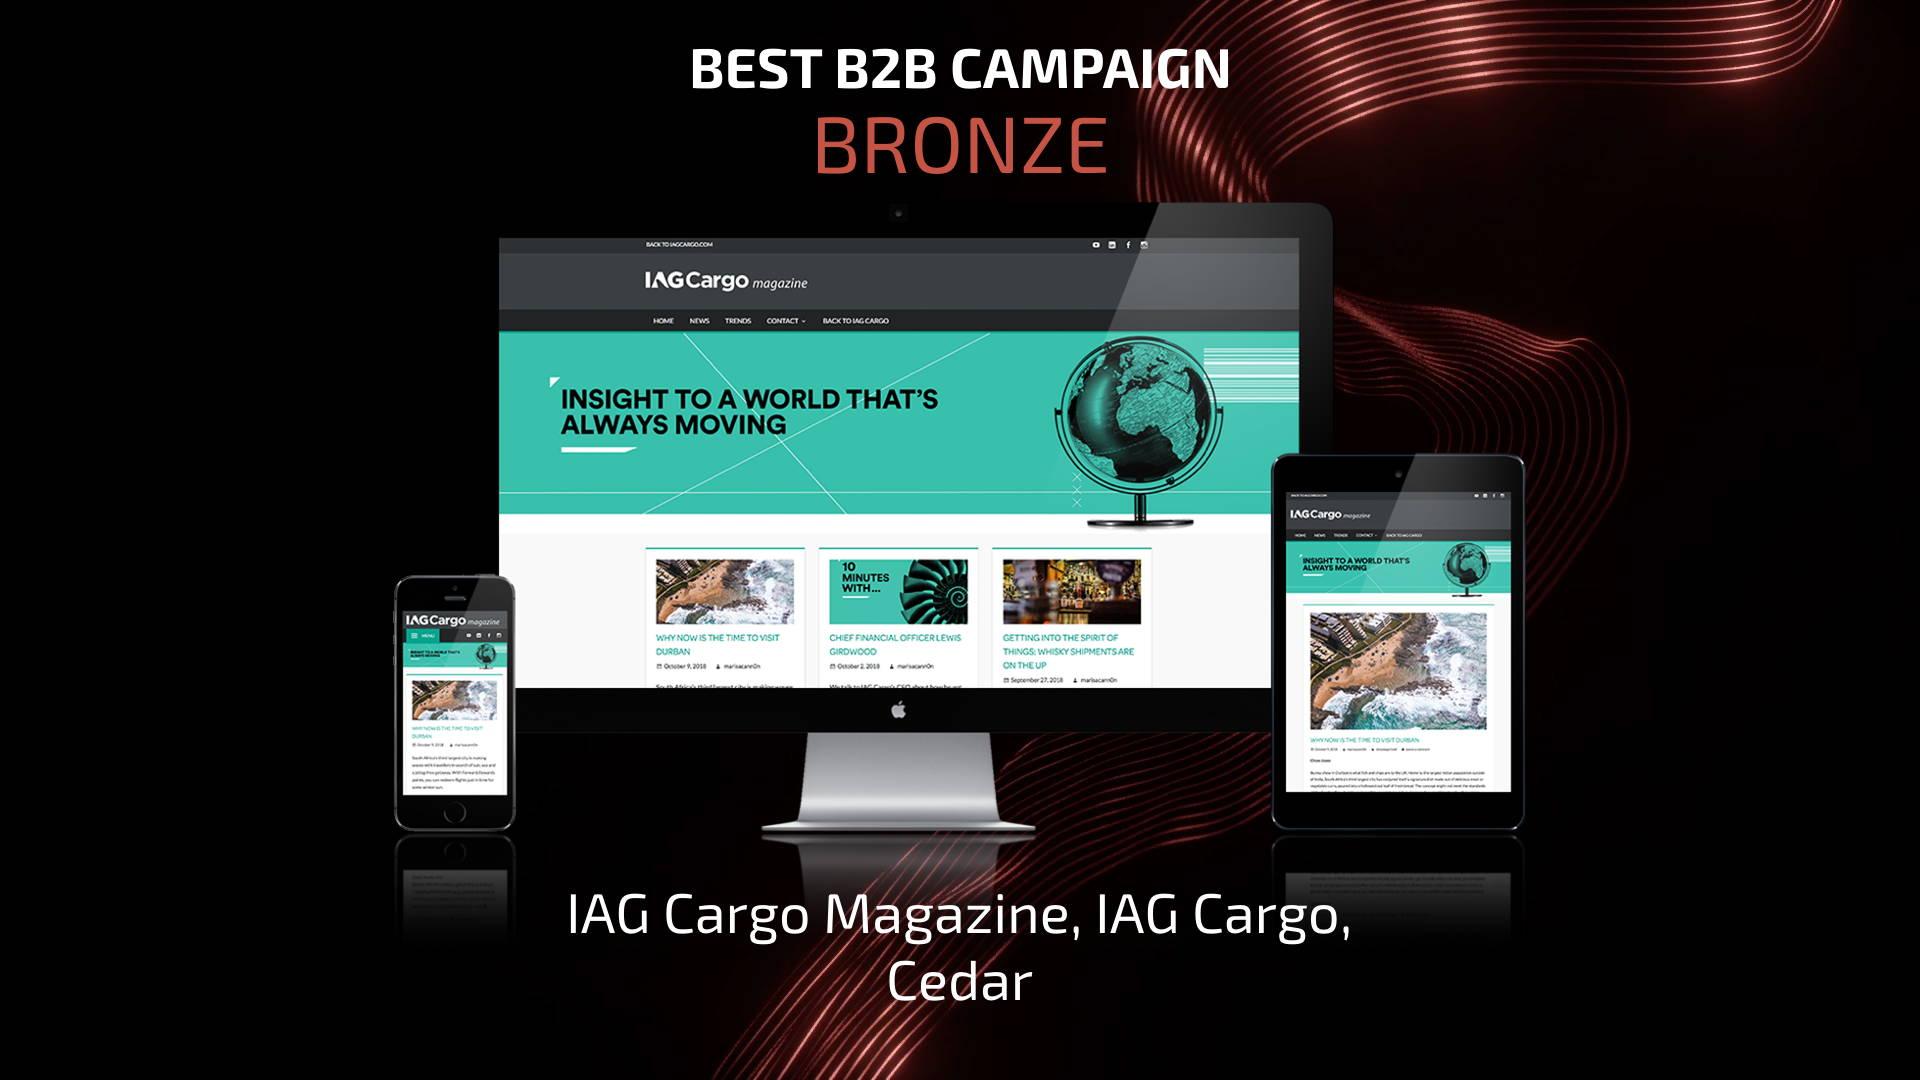 Best B2B - Bronze